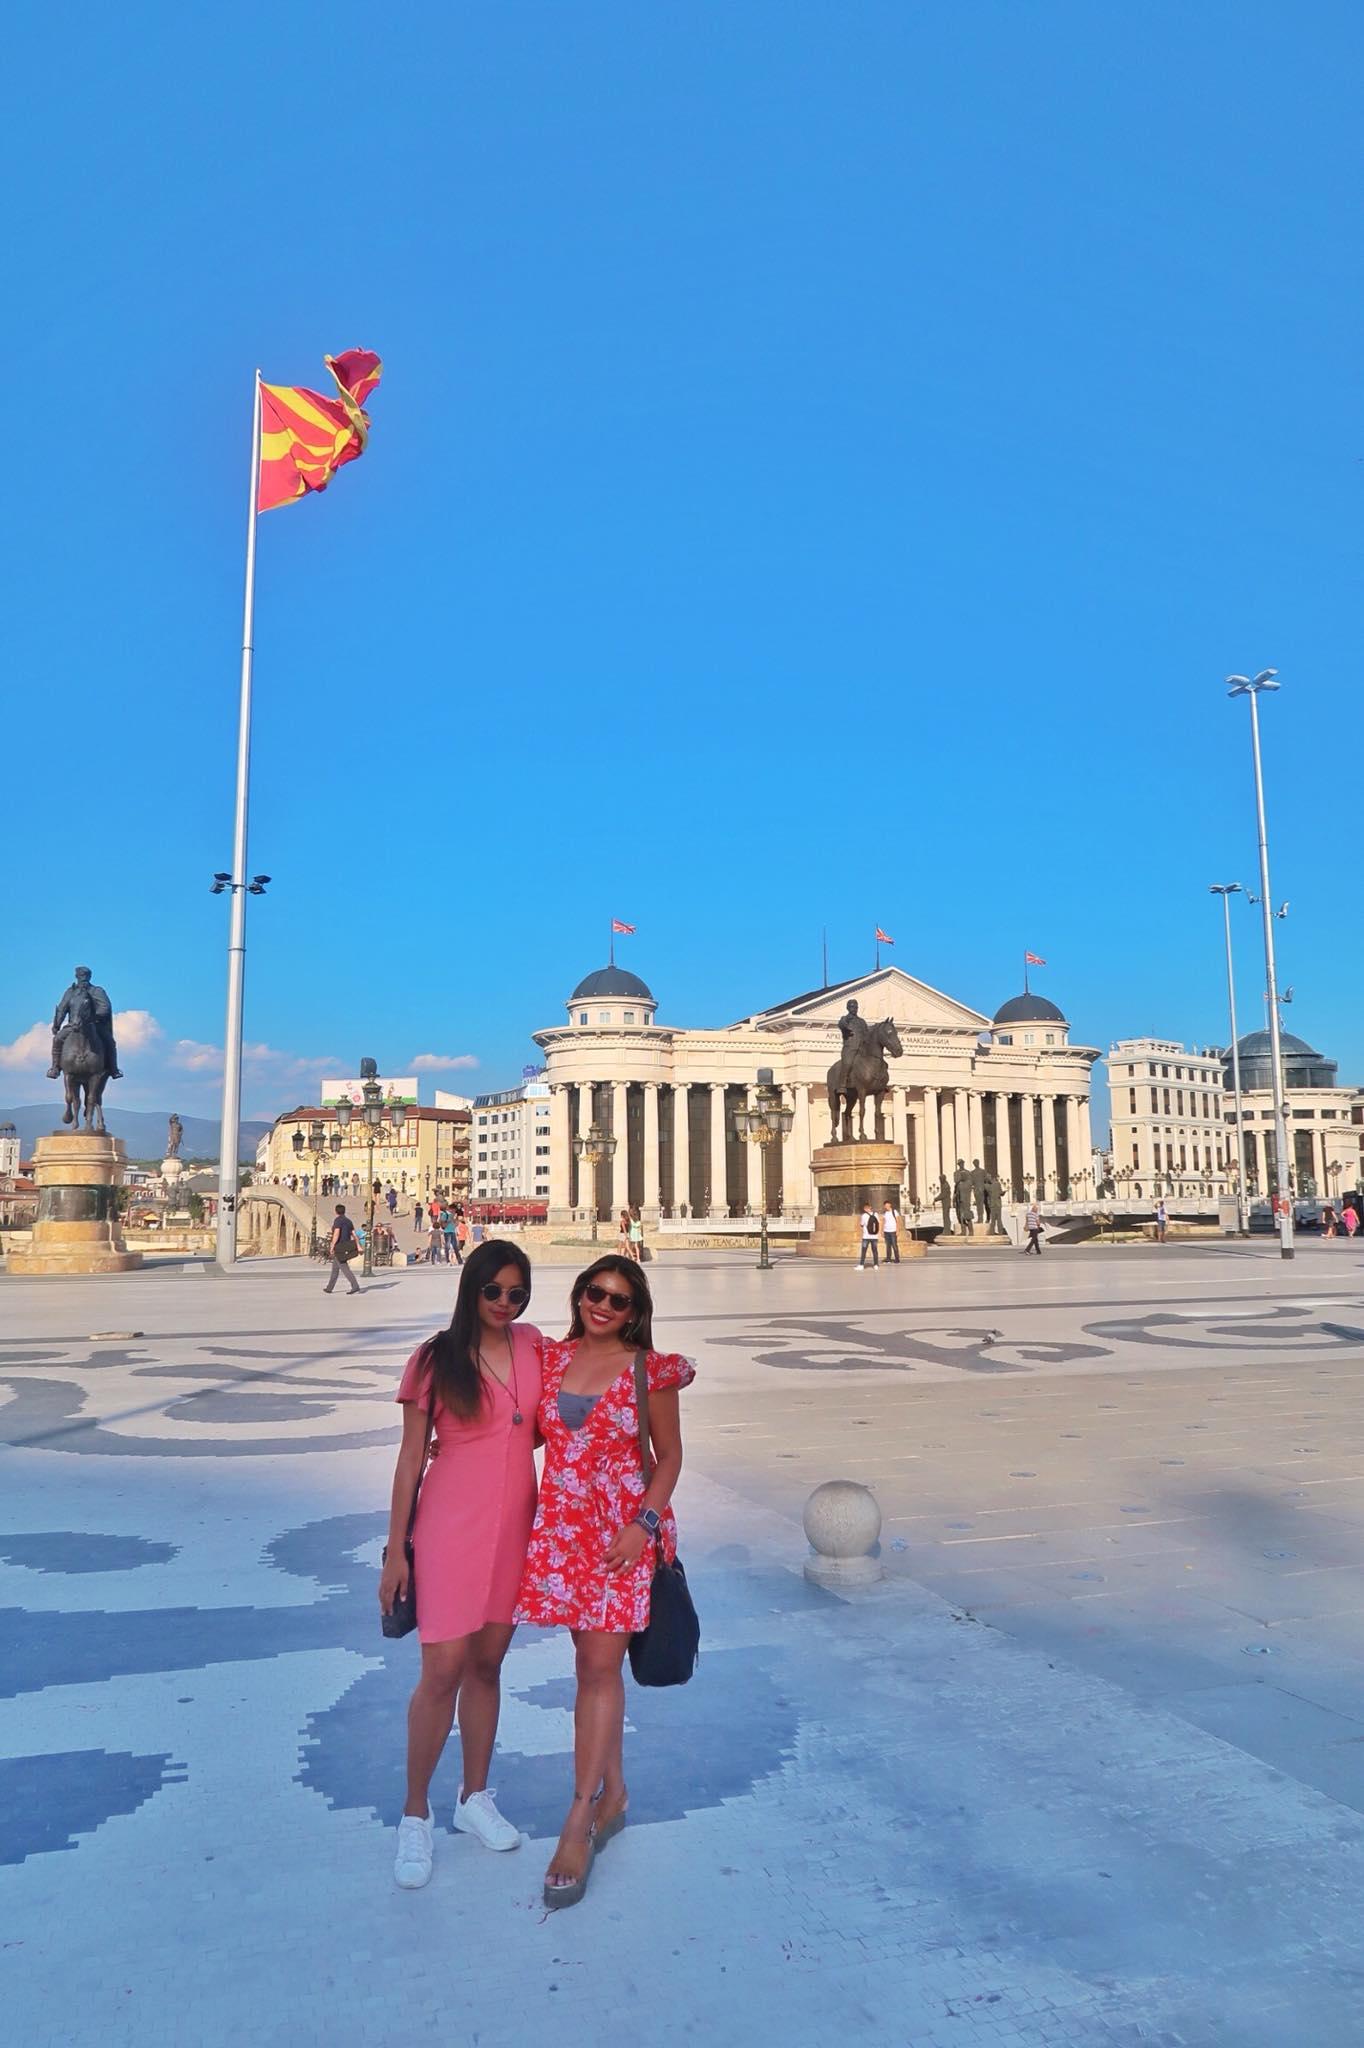 Kach Solo Travels Day 26: Walking Around the Beautiful City Centre of Skopje, Macedonia